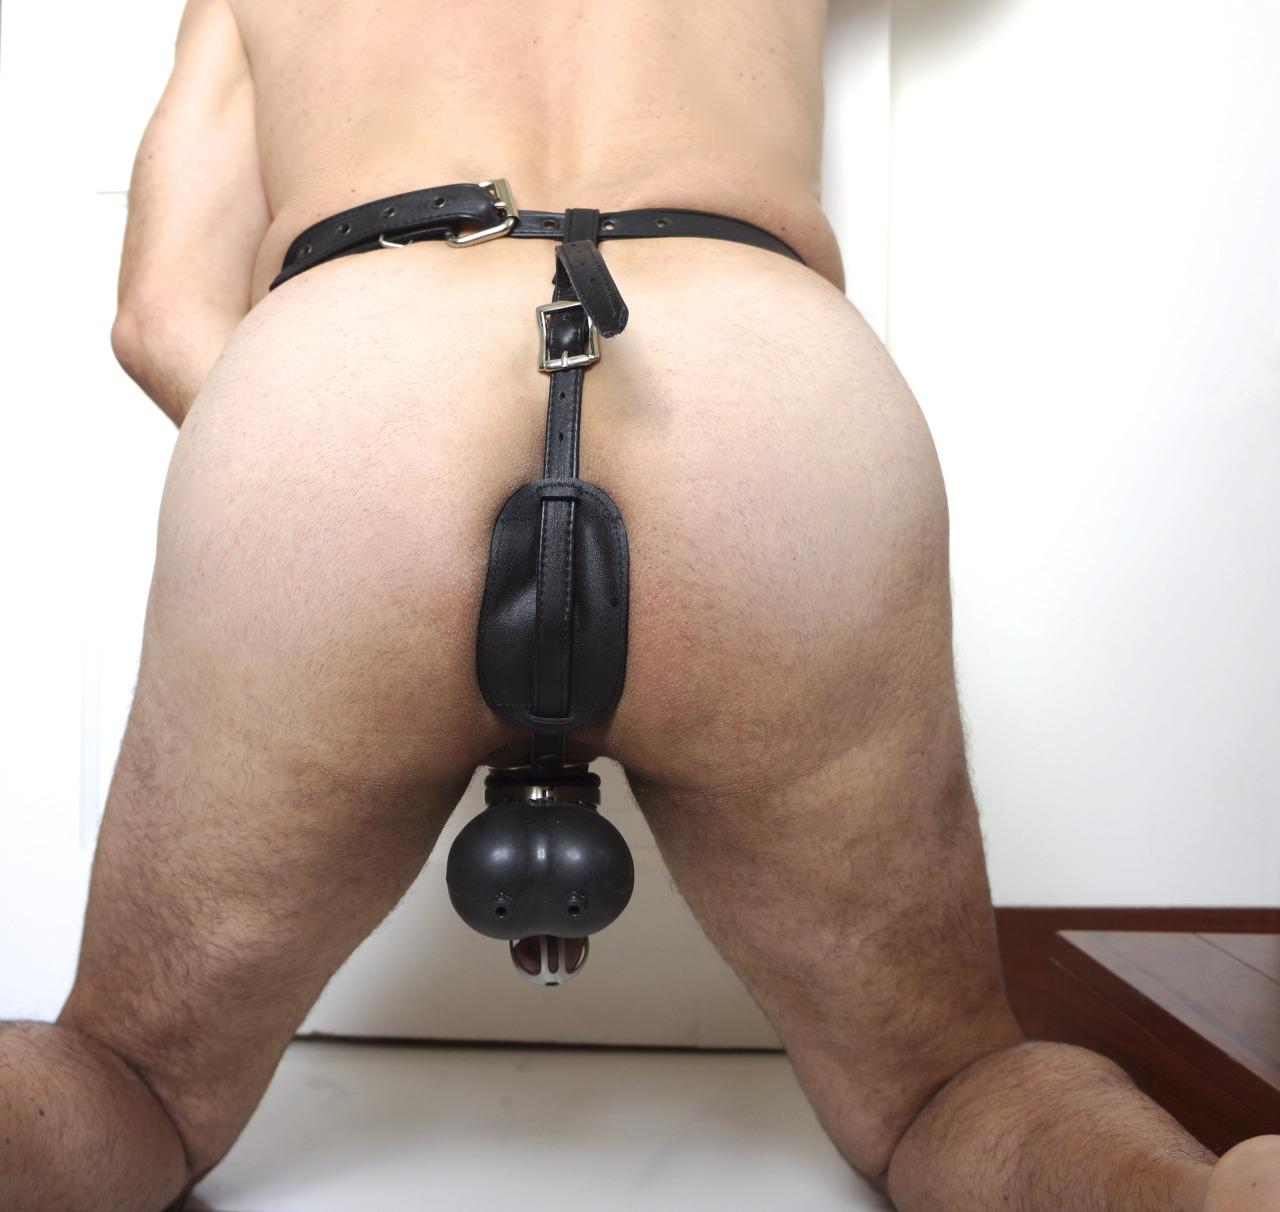 Locking butt plug girls